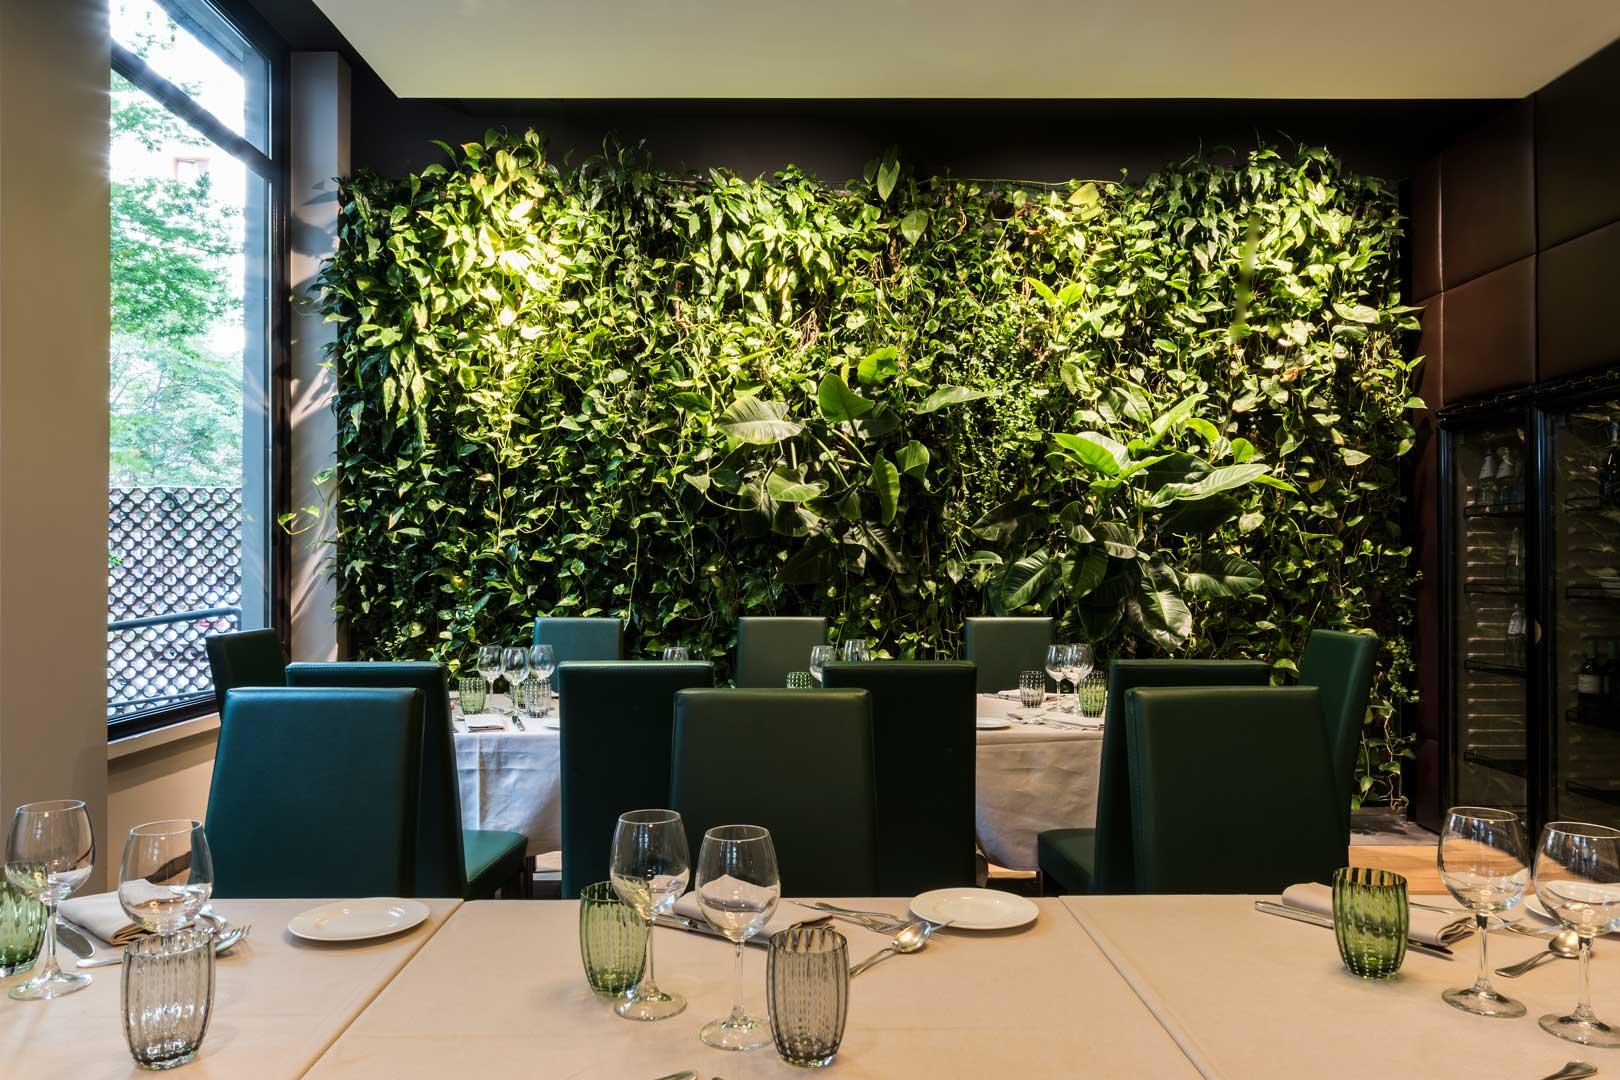 Hotel Manin | Restaurant